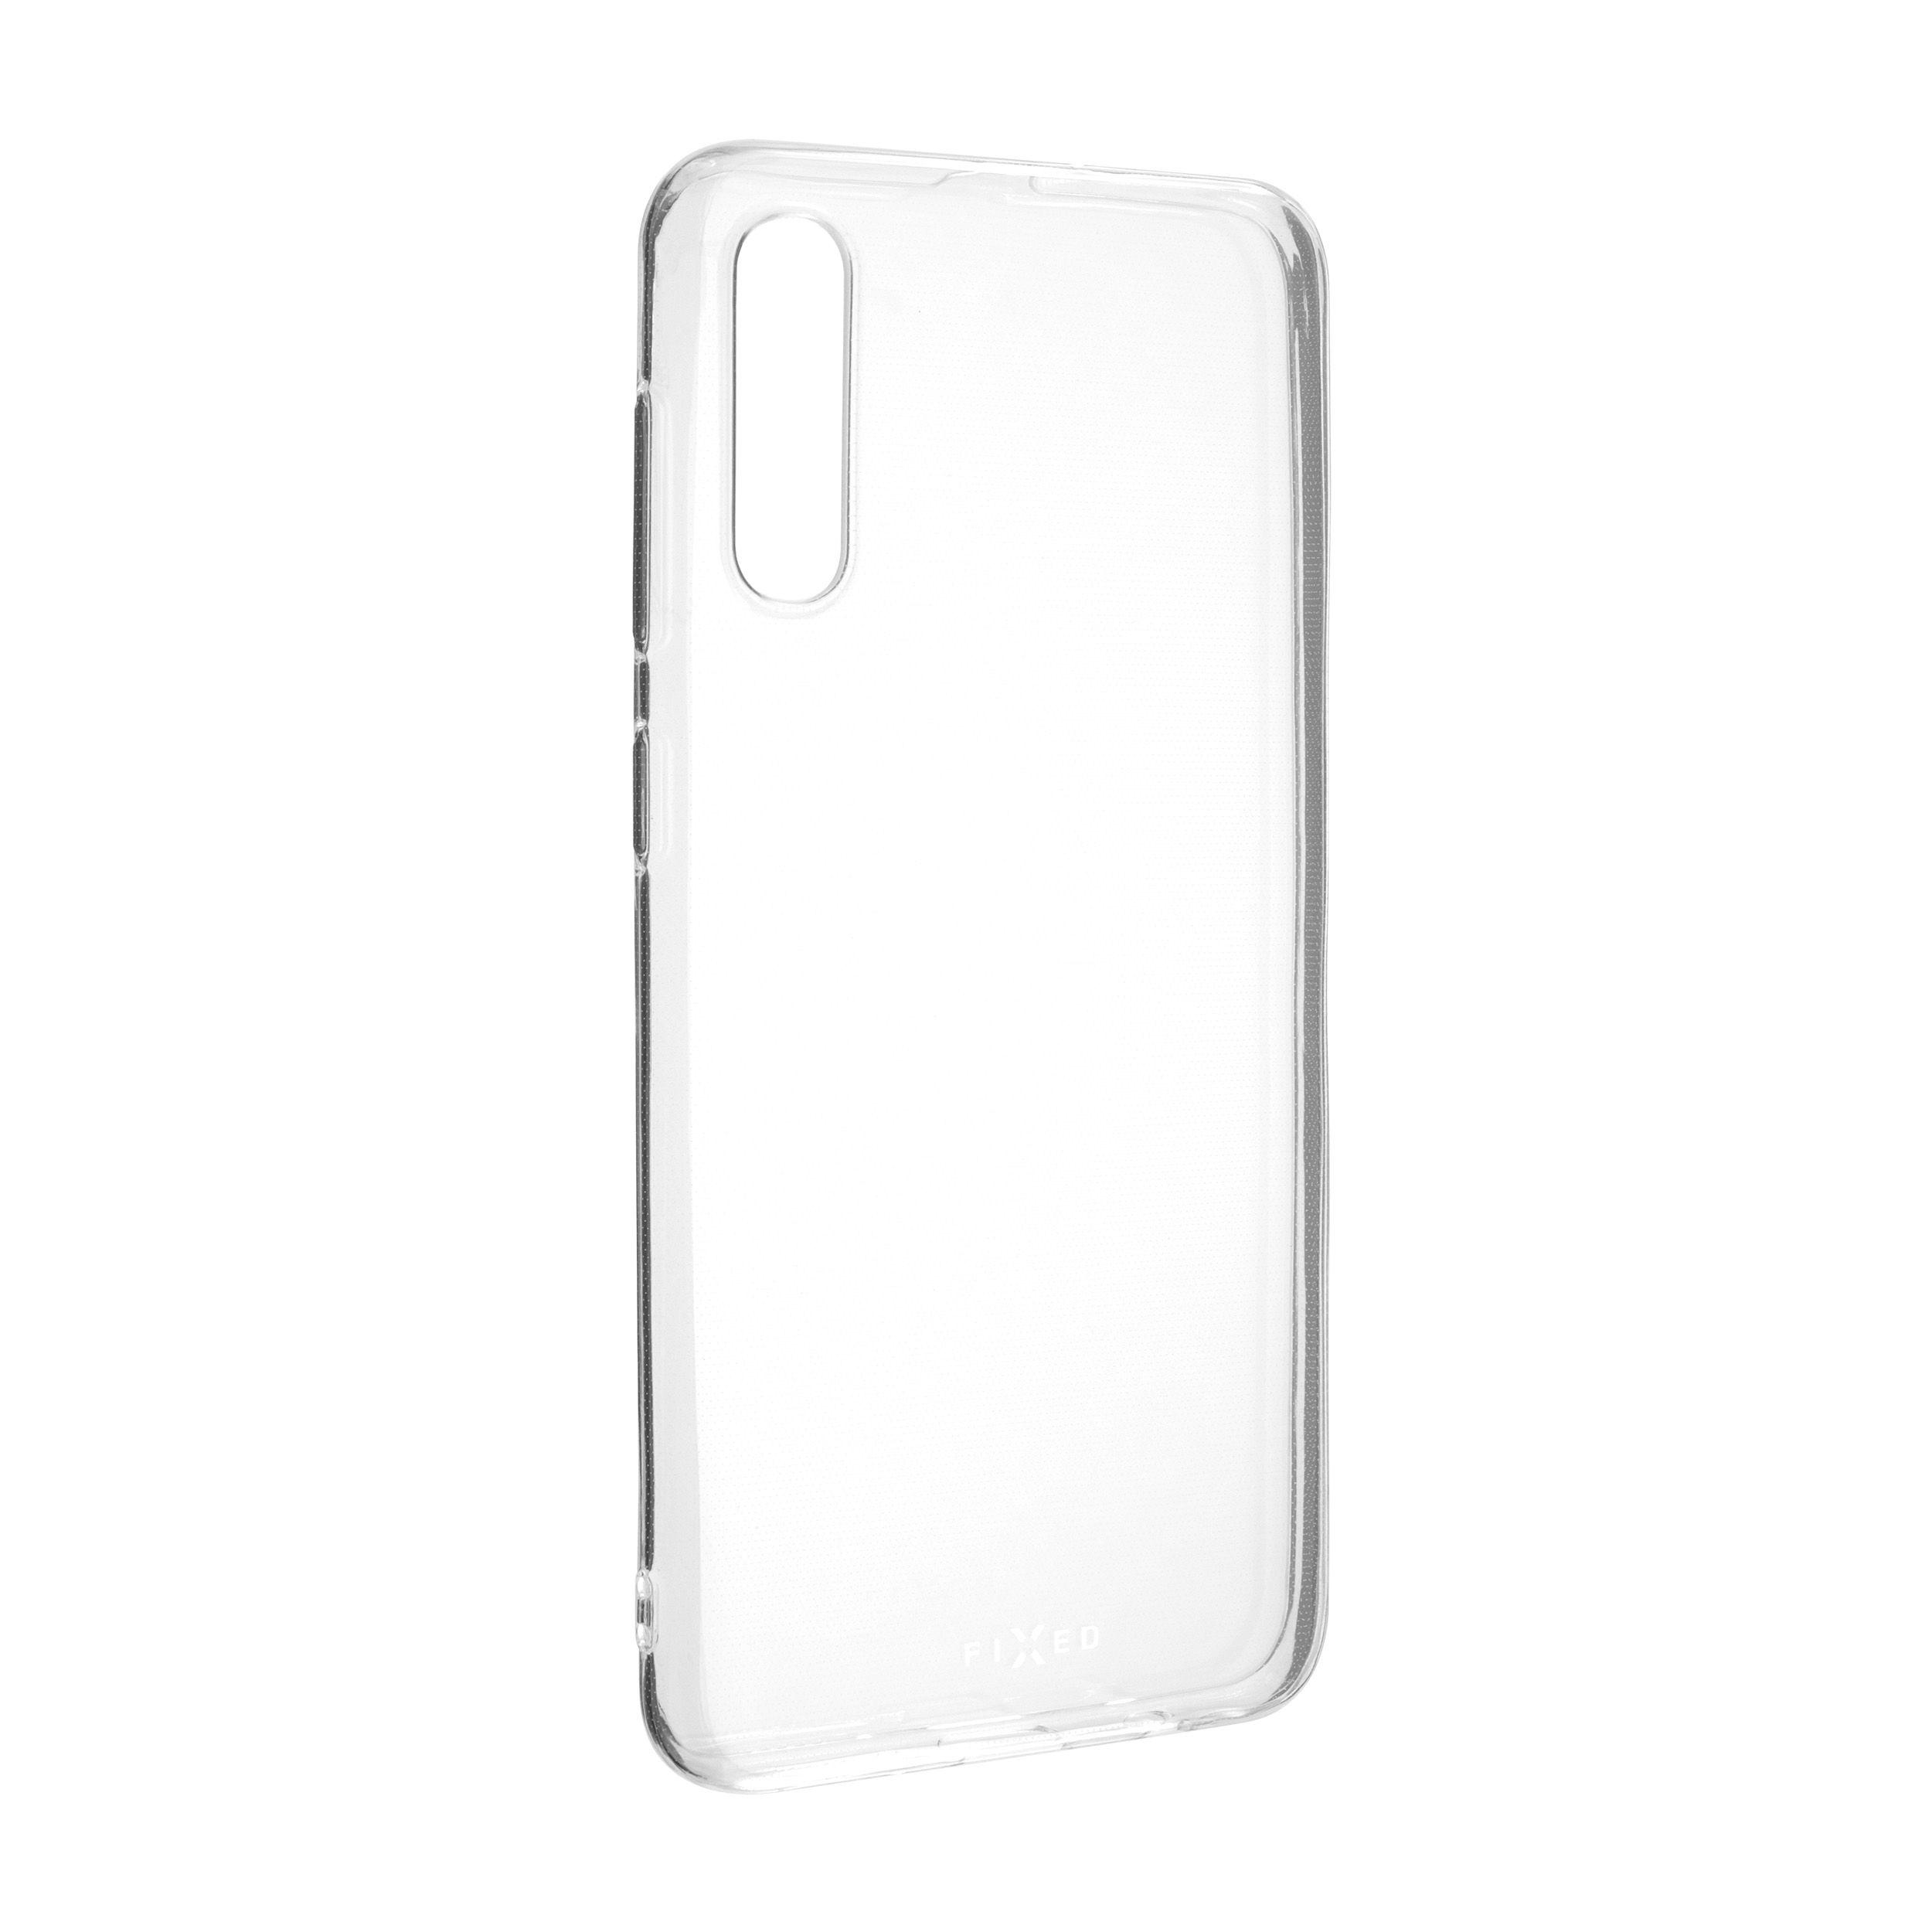 TPU gelové pouzdro FIXED pro Samsung Galaxy A50s/A30s, čiré